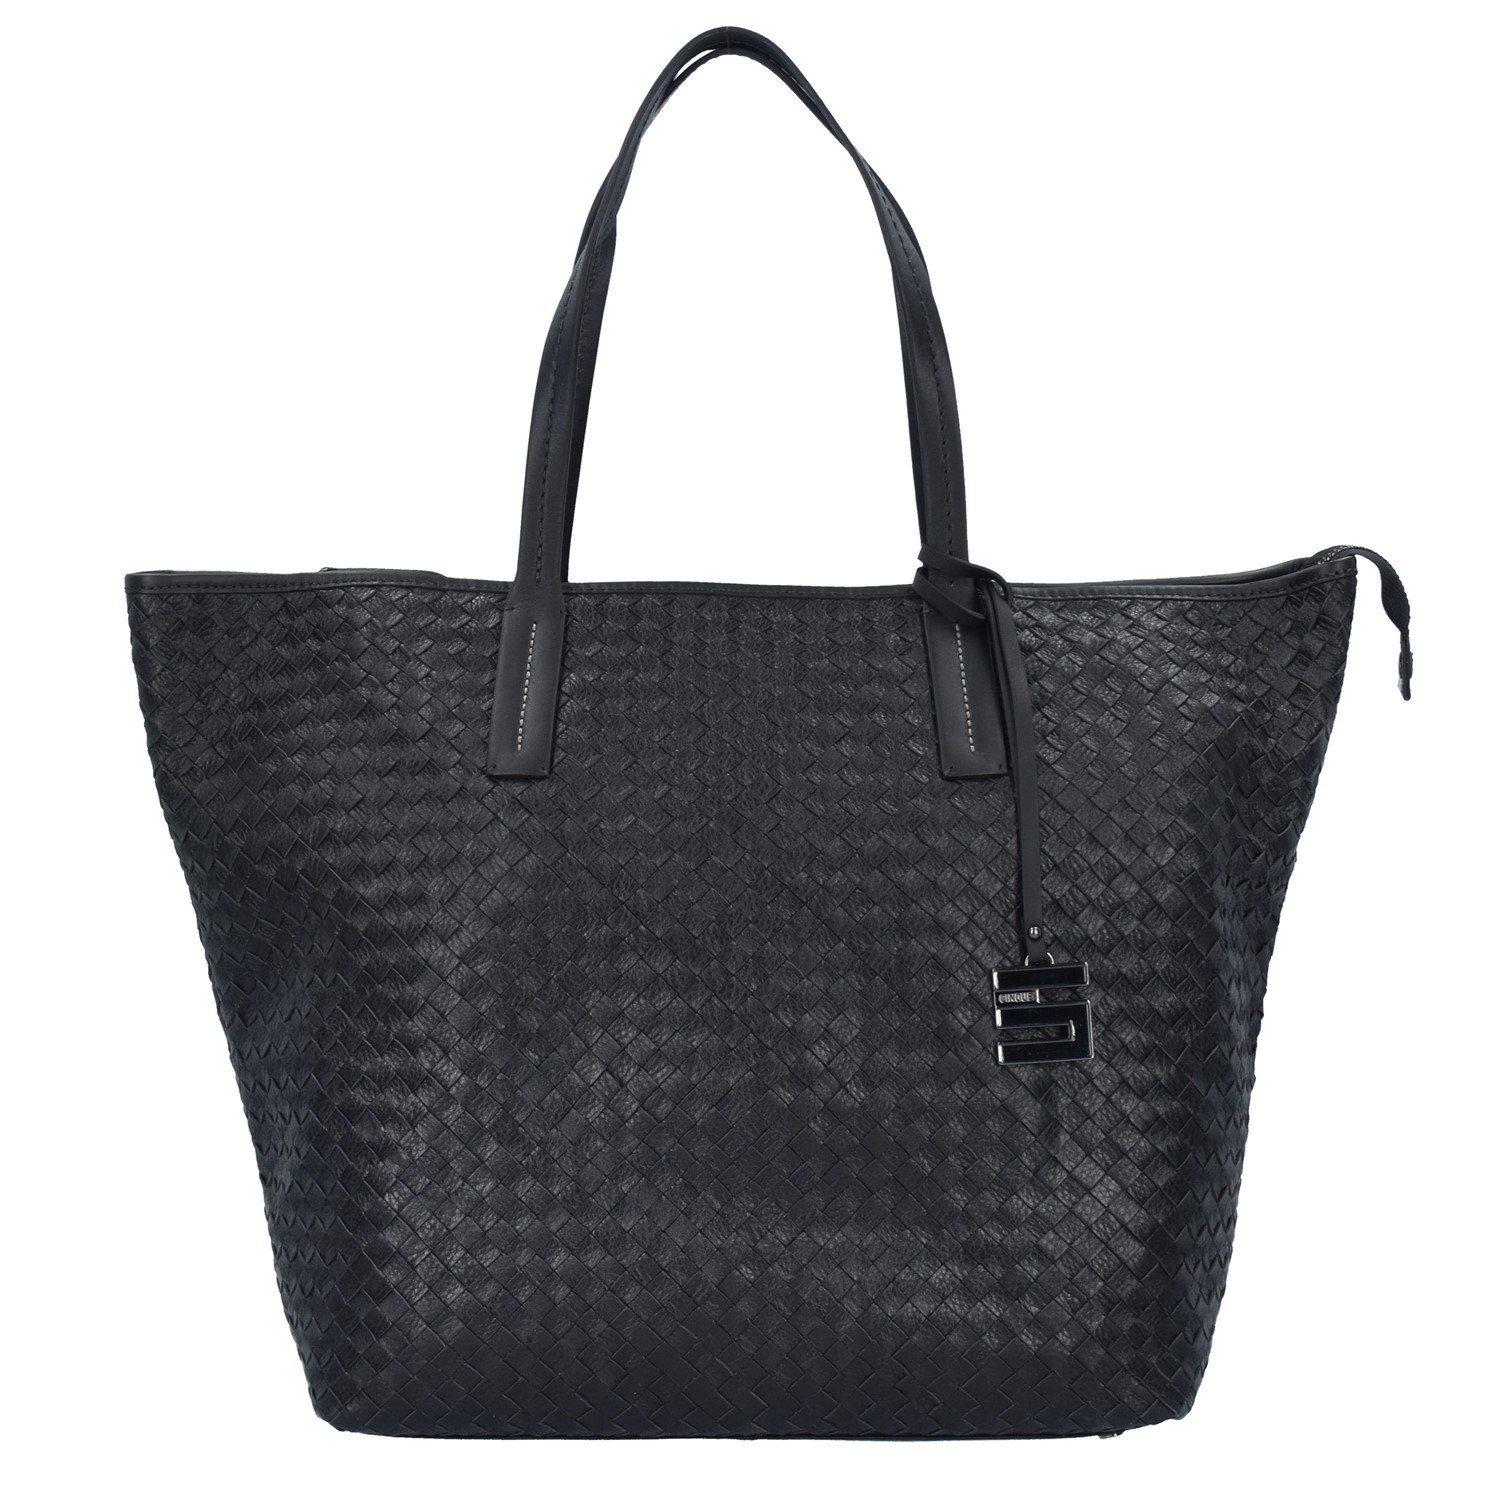 Cinque Cosma Shopper Tasche Leder 51 cm